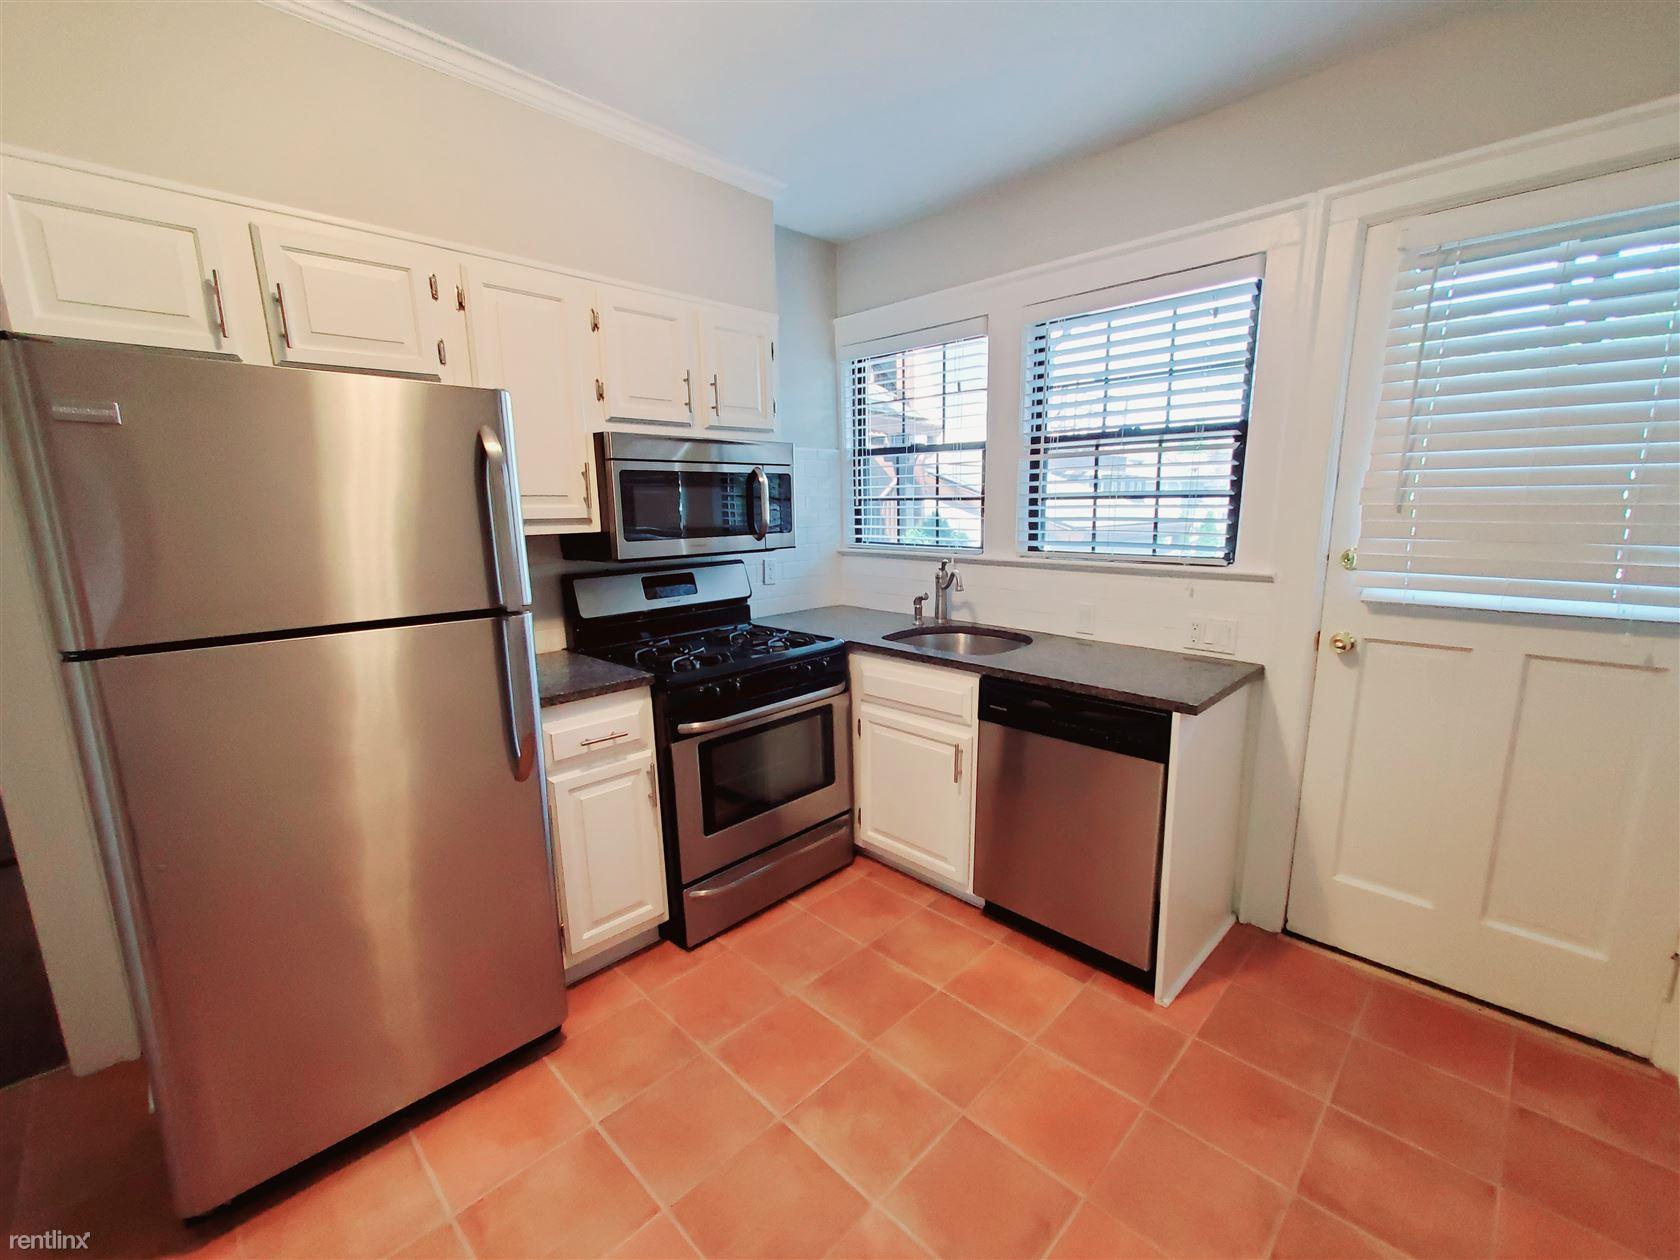 West Ave., Darien, CT - $2,400